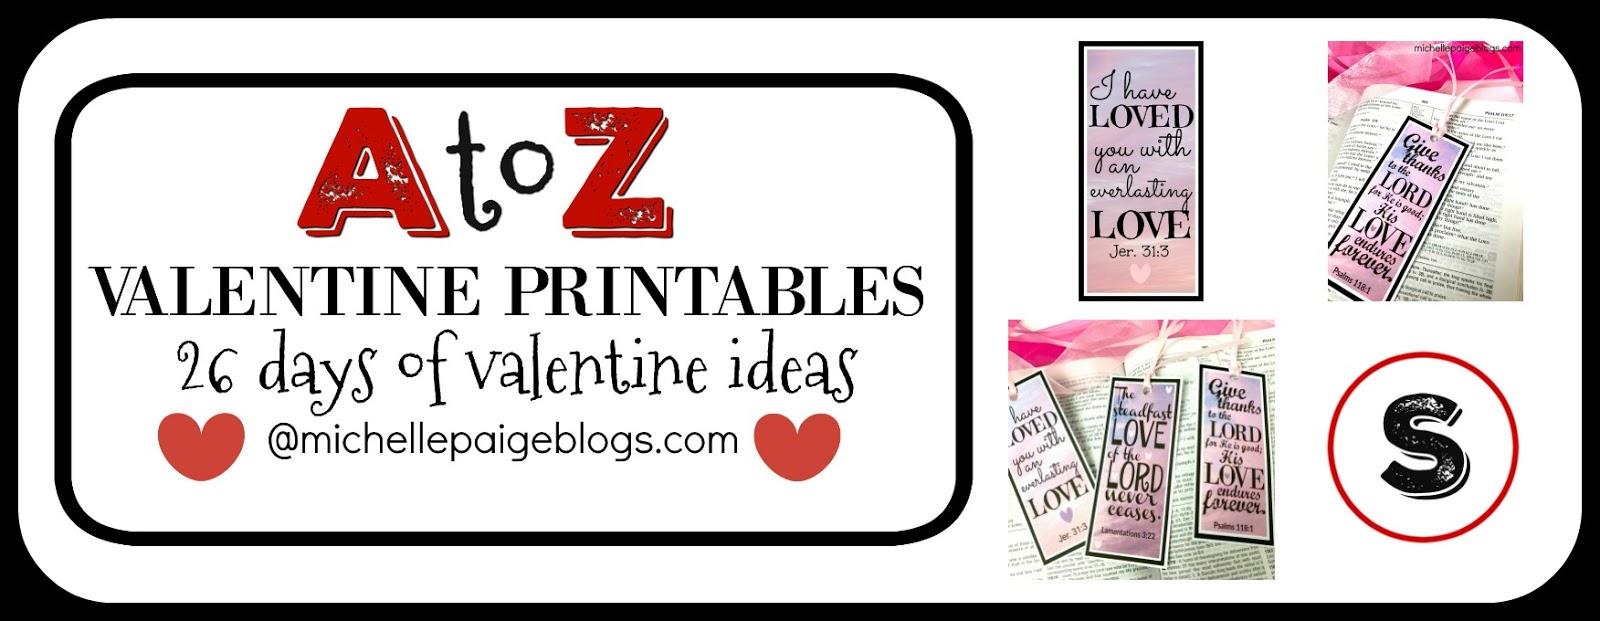 Michelle Paige Blogs 10 Scripture Valentines To Print